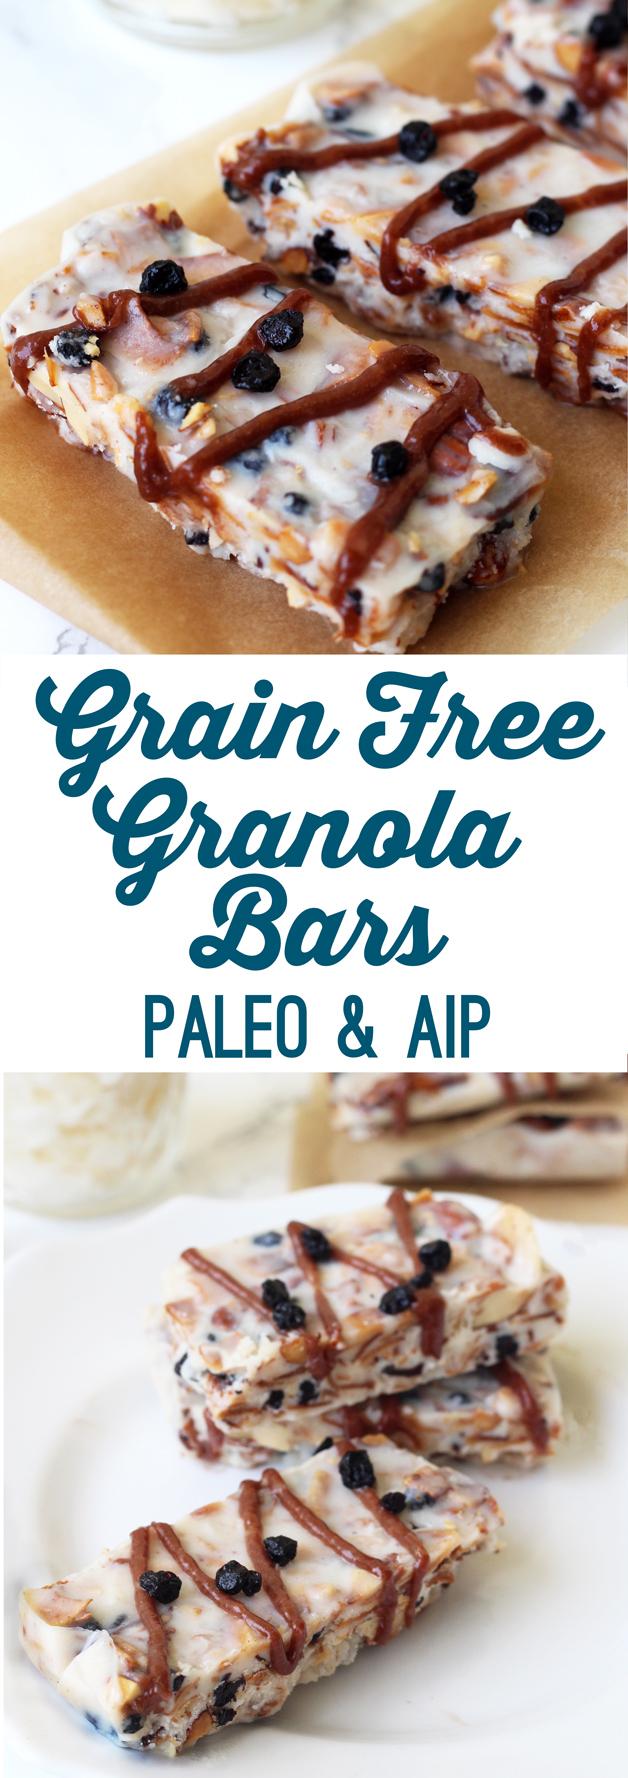 Grain Free Granola Bars (paleo & AIP)